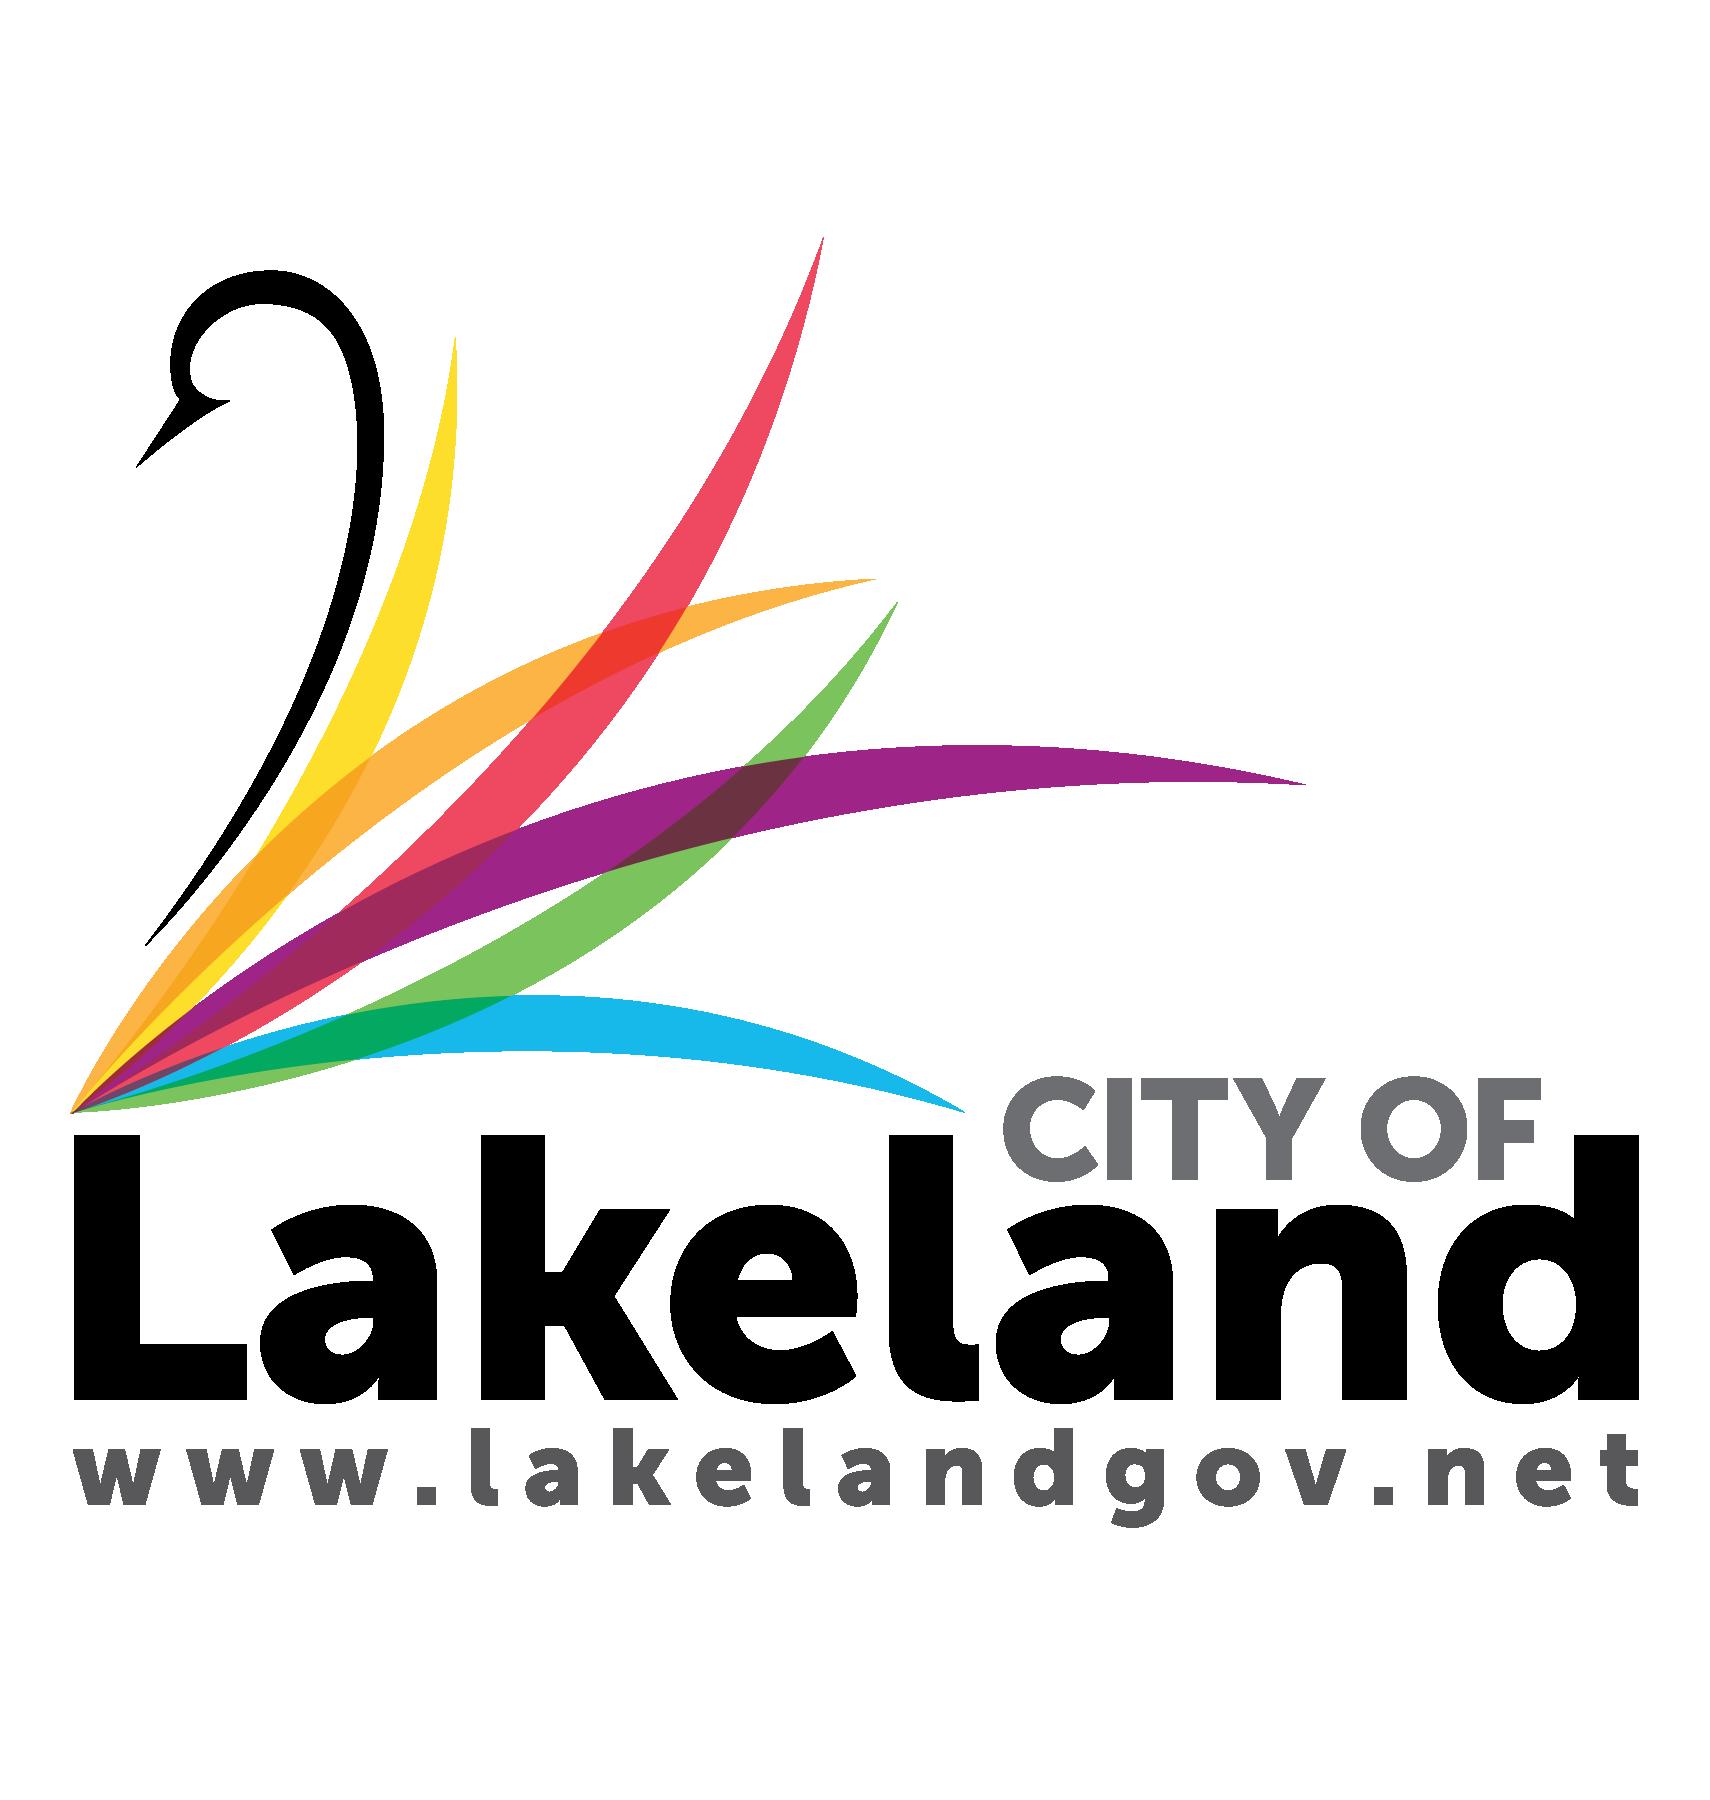 City of Lakeland Logo for Catapult Lakeland Corporate Sponsorship